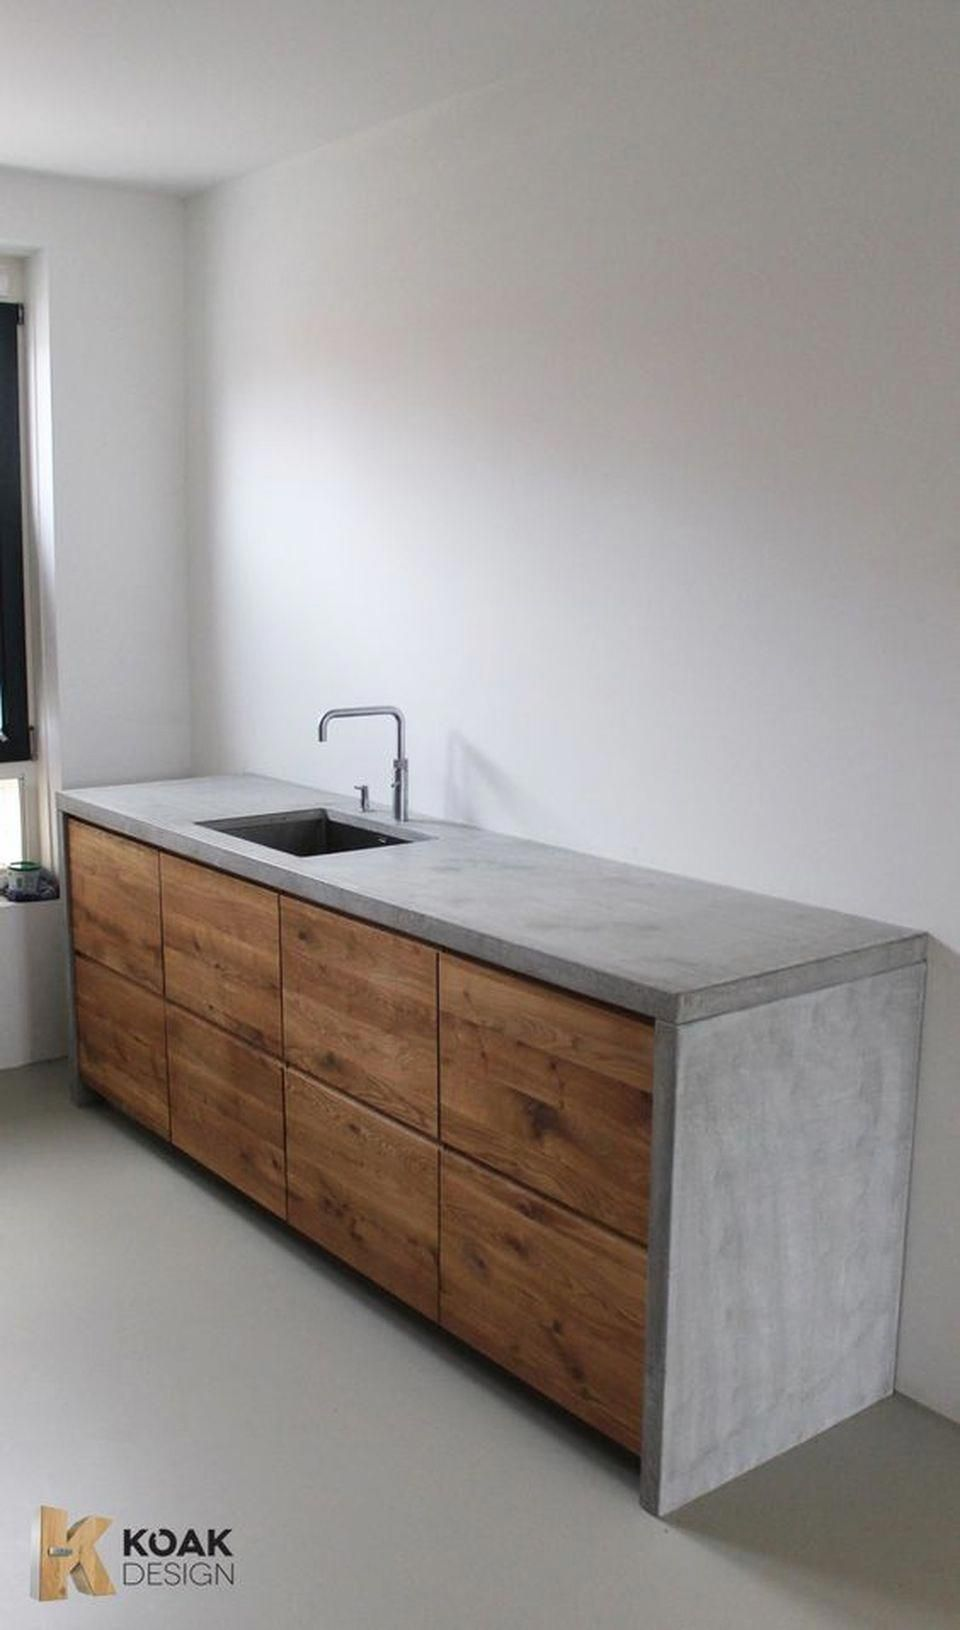 Kitchen_ideas - SalePrice:41$ | Diy concrete countertops ...